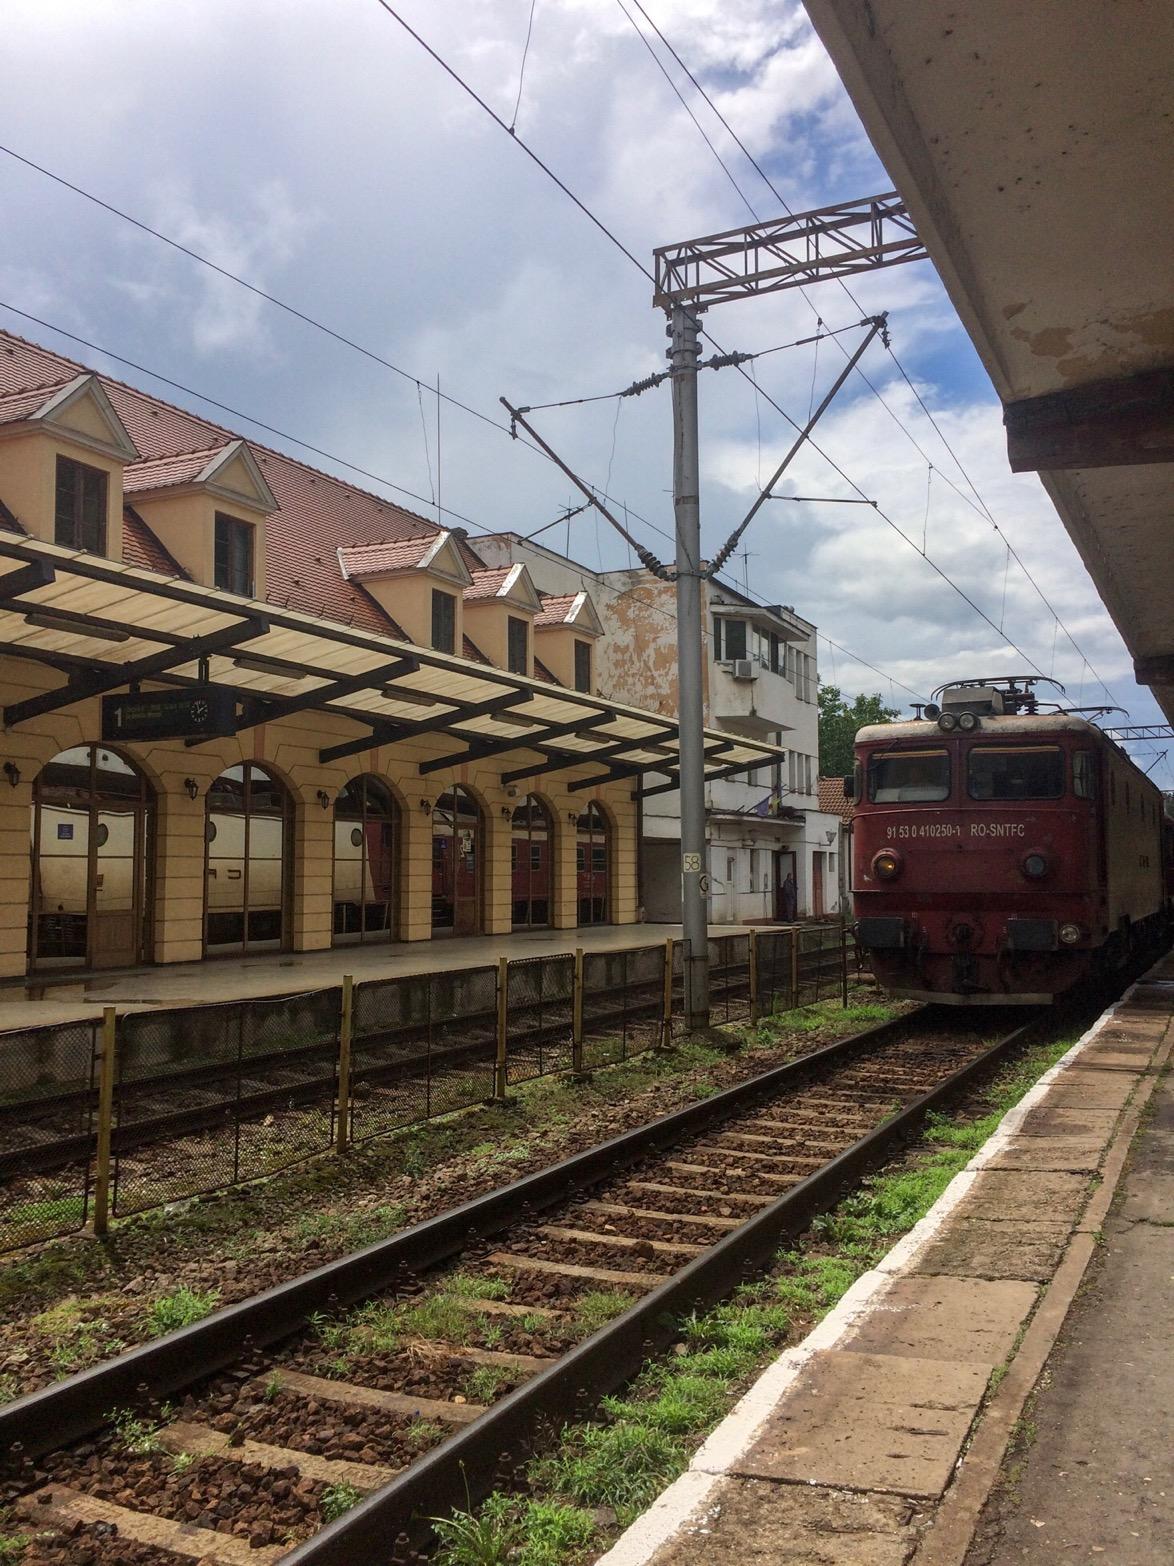 Train arriving in Romania